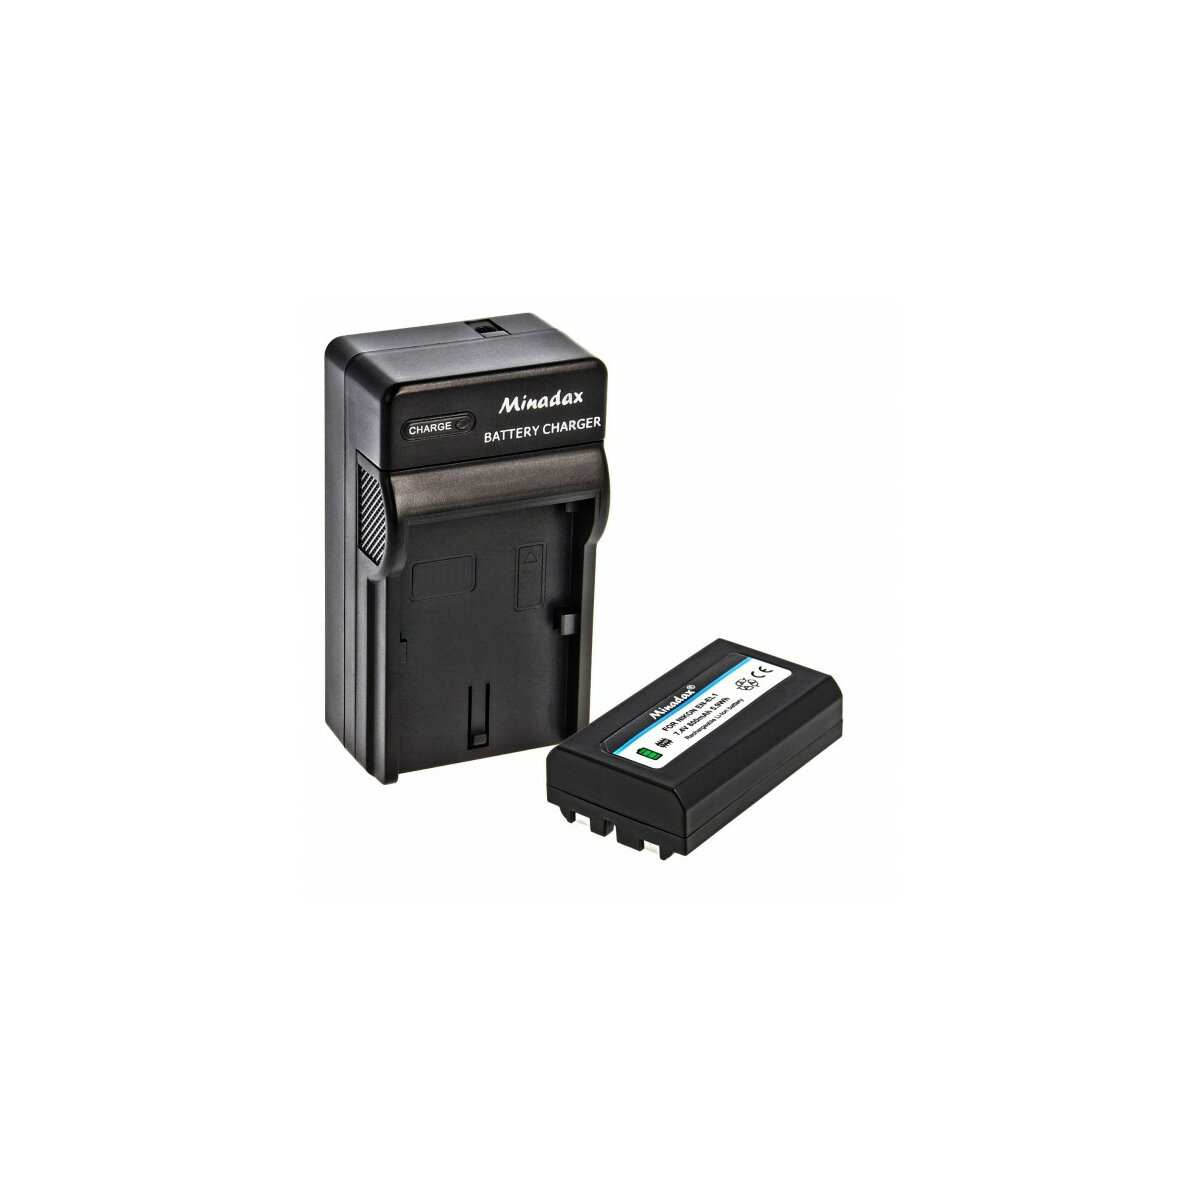 Minadax® Ladegerät 100% kompatibel mit Nikon EN-EL1 inkl. Auto Ladekabel, Ladeschale austauschbar + 1x Akku Ersatz für EN-EL1